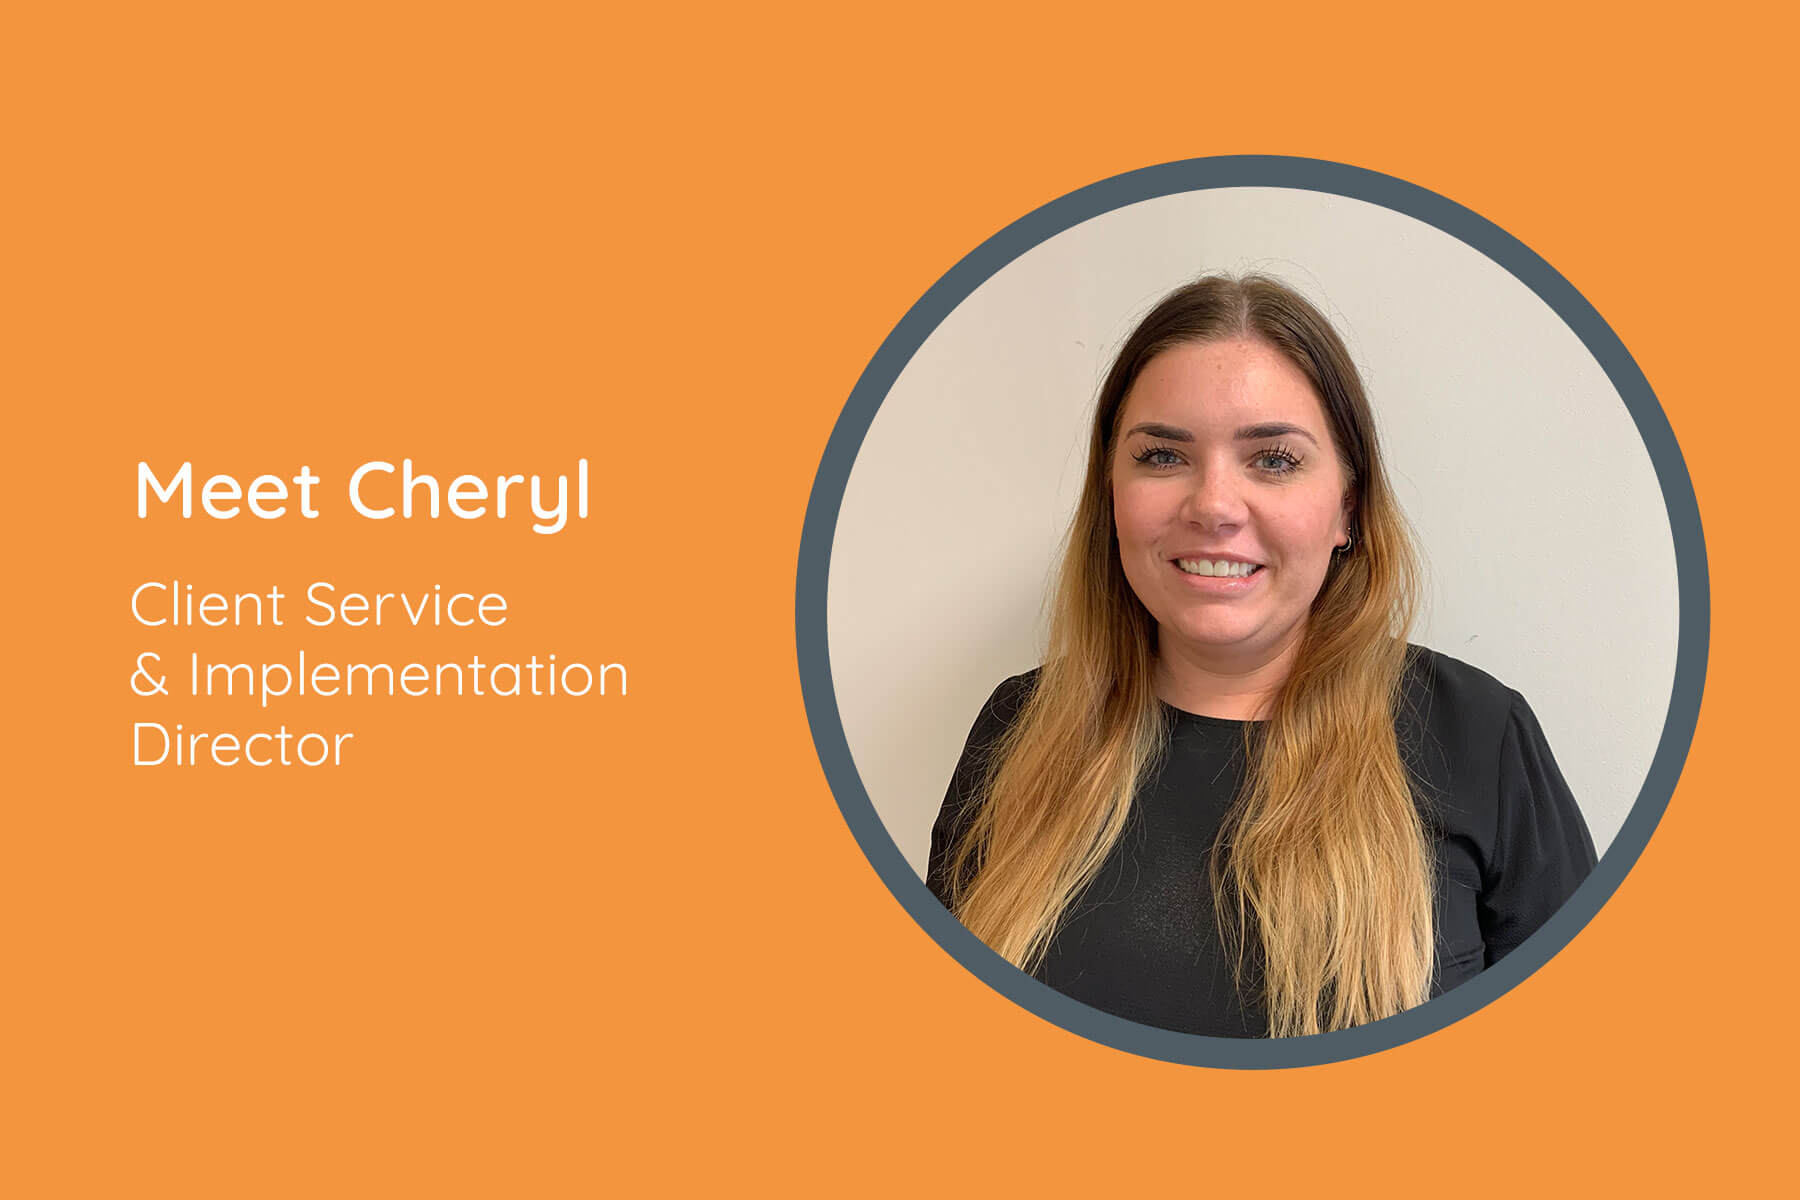 Cheryl McDonald joins mmi Analytics senior leadership team